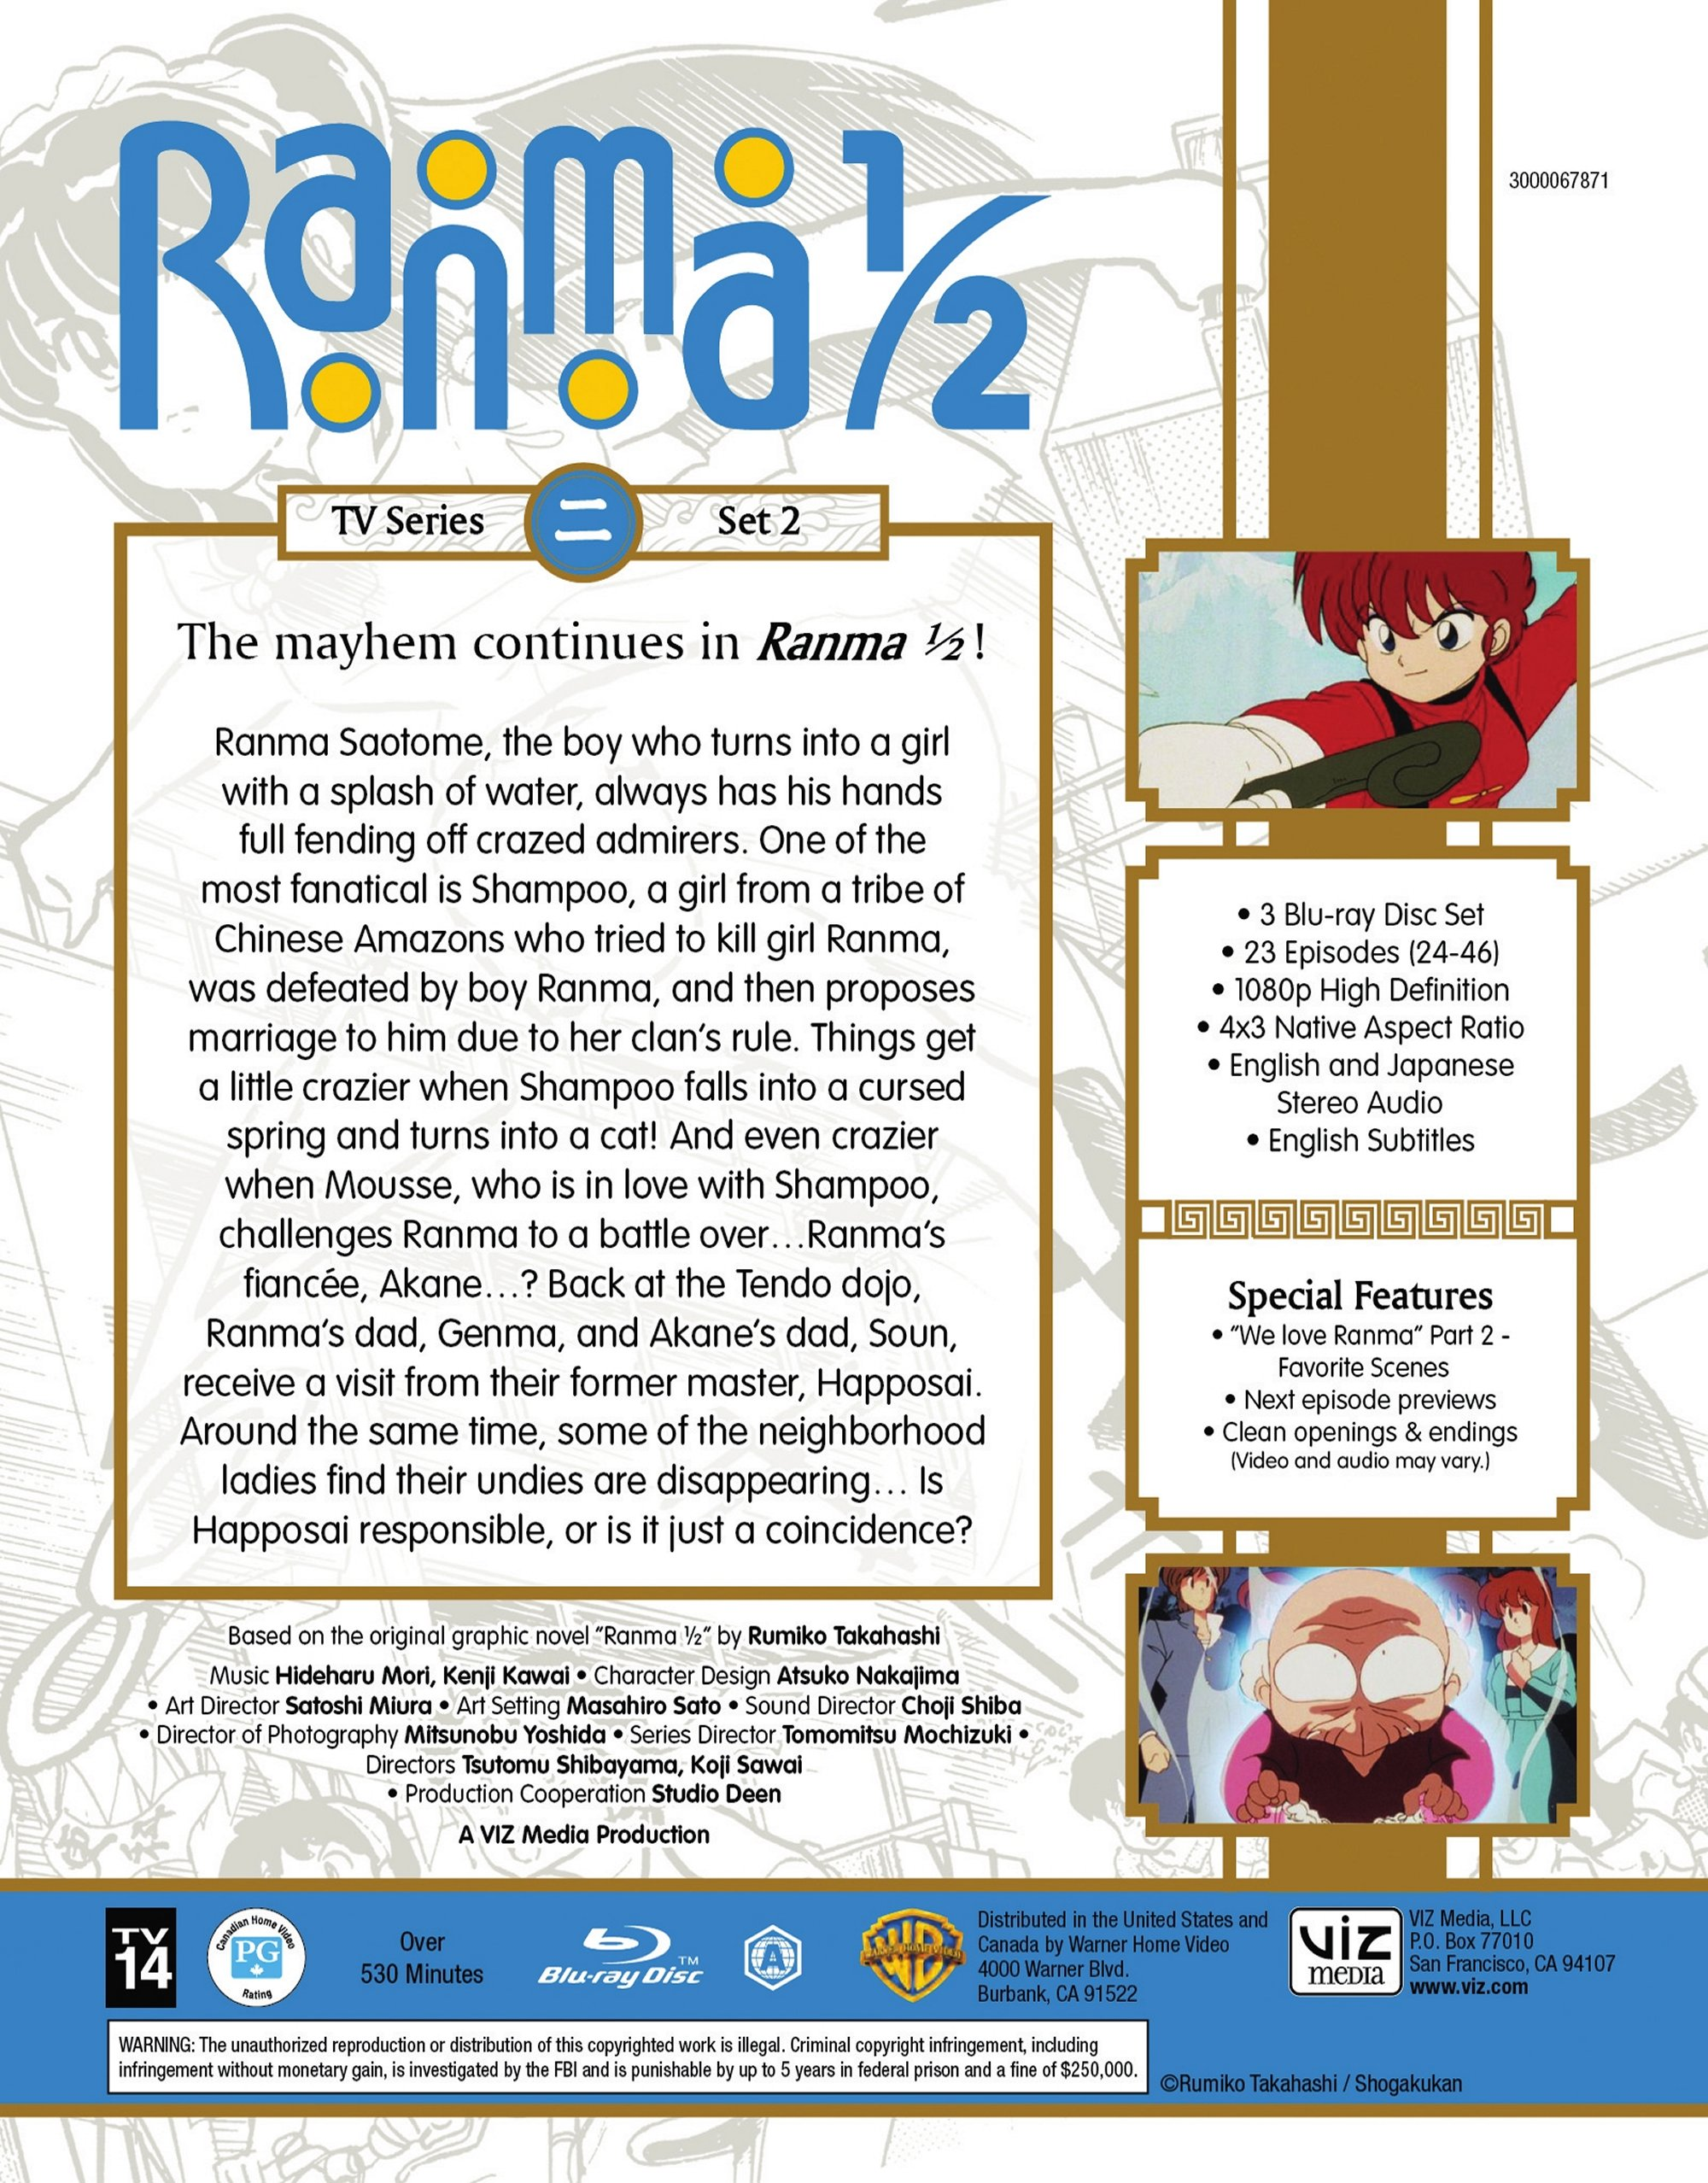 Ranma 1/2 Standard Edition Blu-ray Set 2